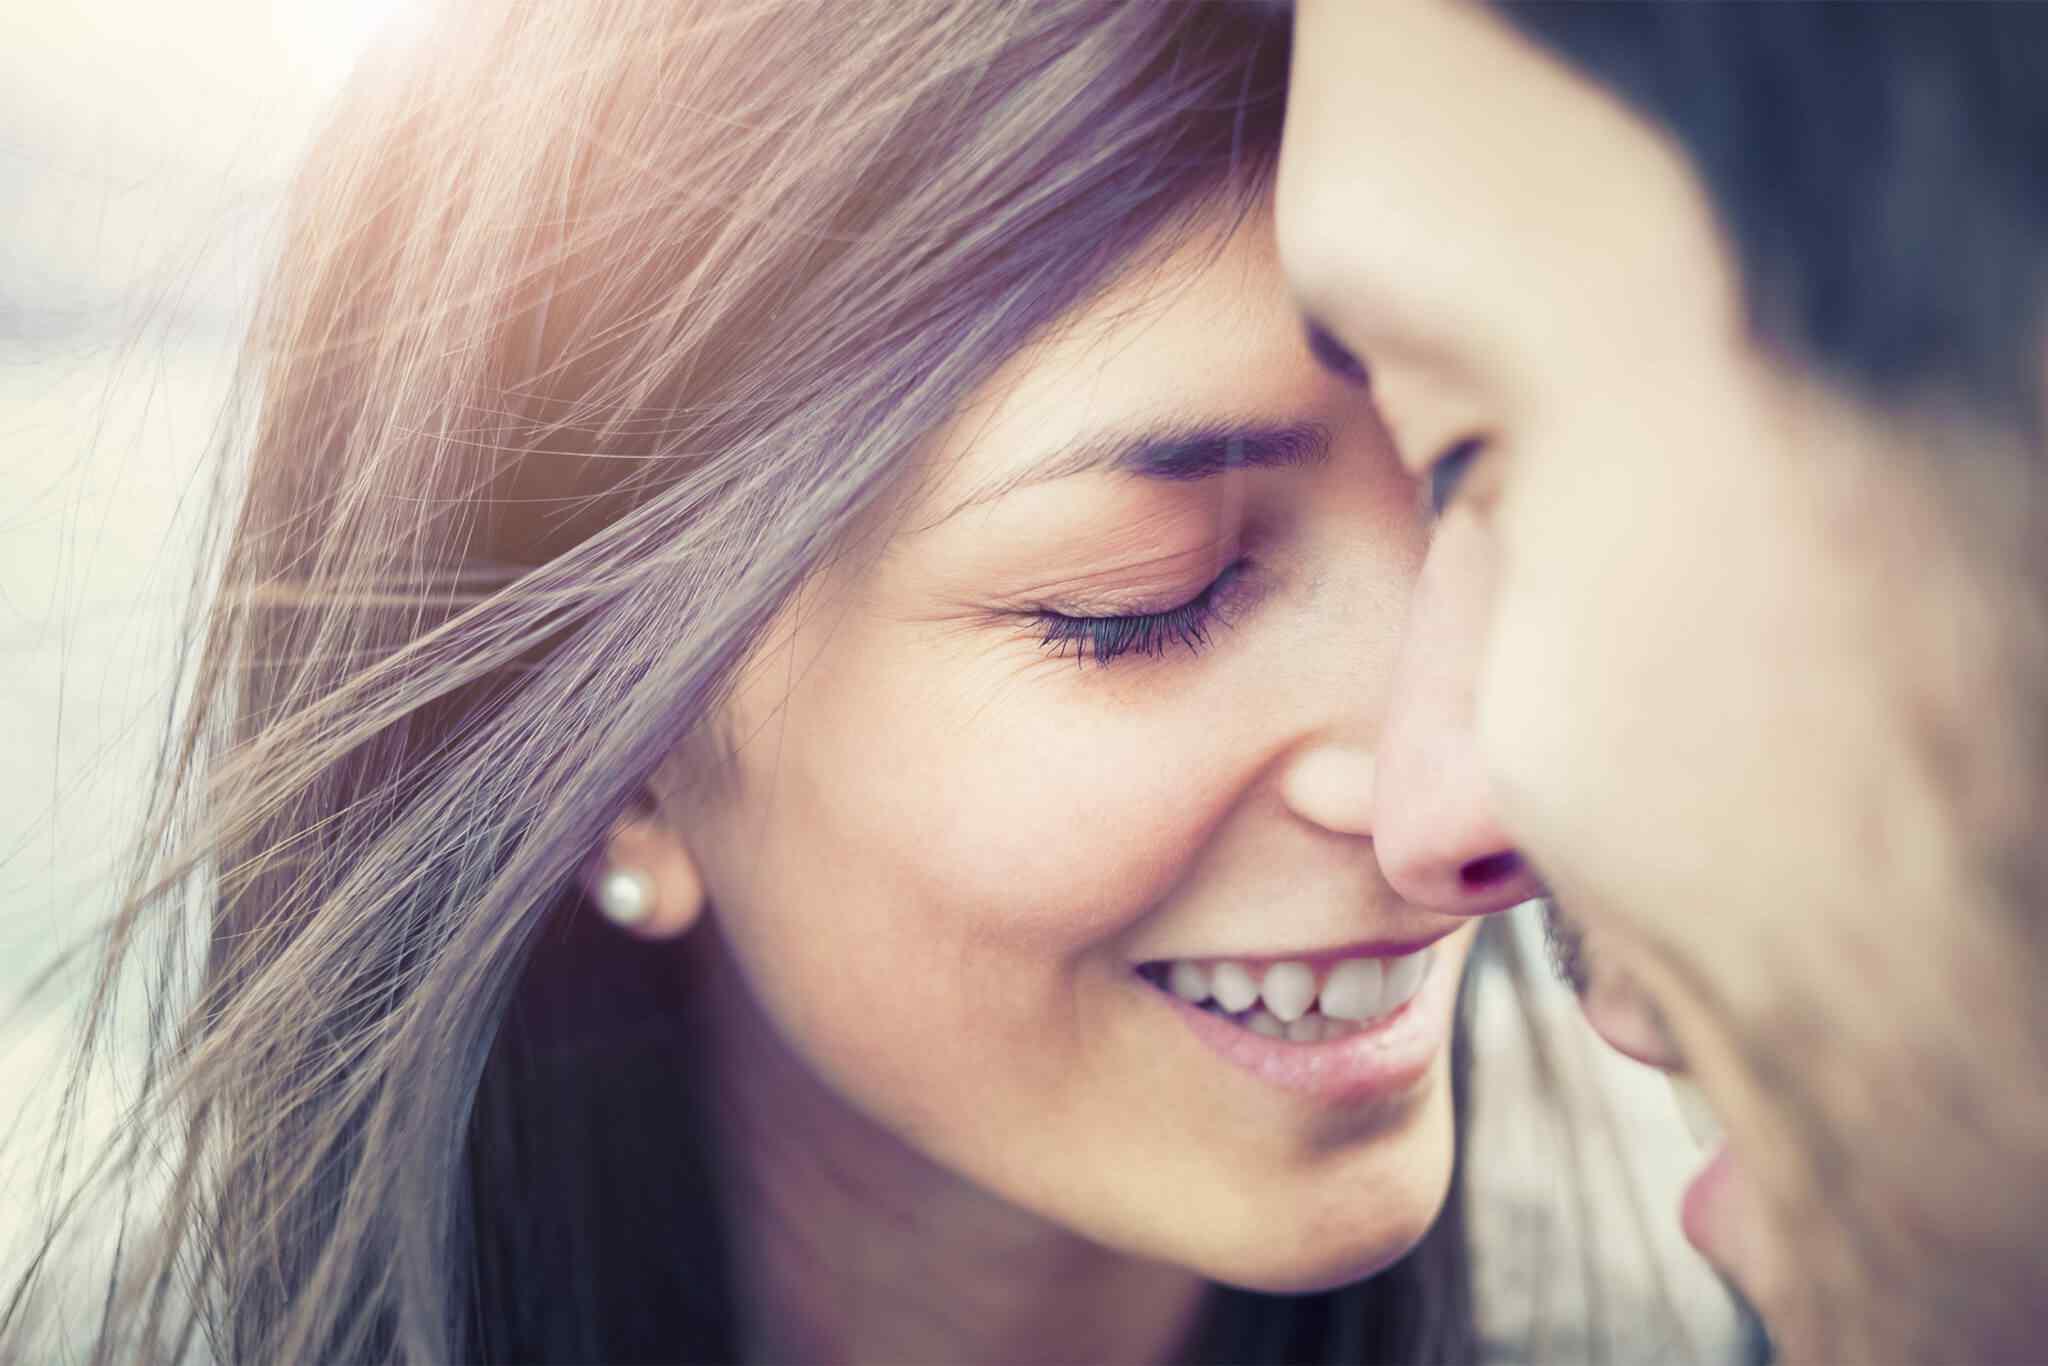 http://mirelasula.com/wp-content/uploads/2018/01/img-class-marriage-01.jpg